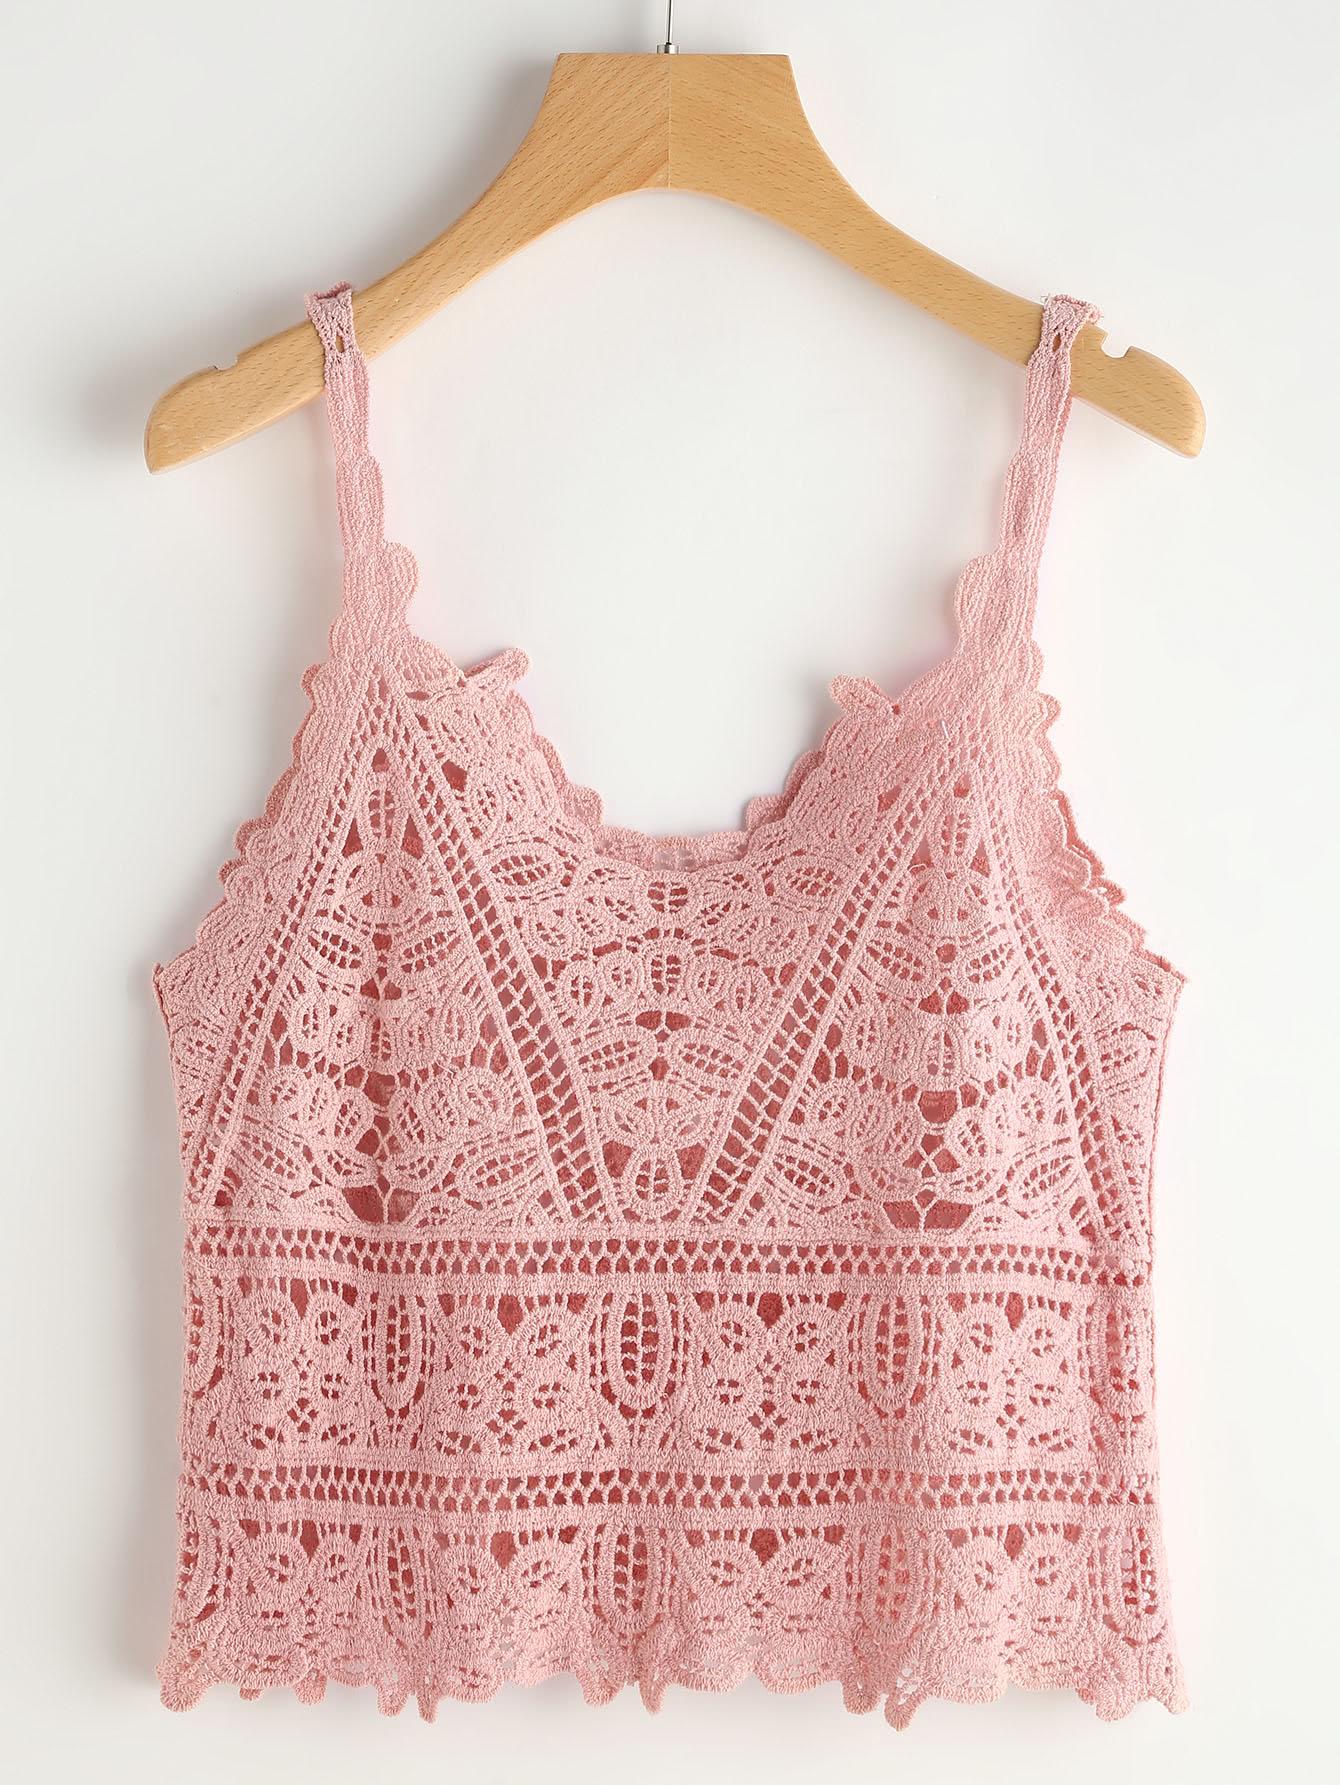 Crochet Lace Cami Top - Knitting, Crochet, Diy, Craft ...